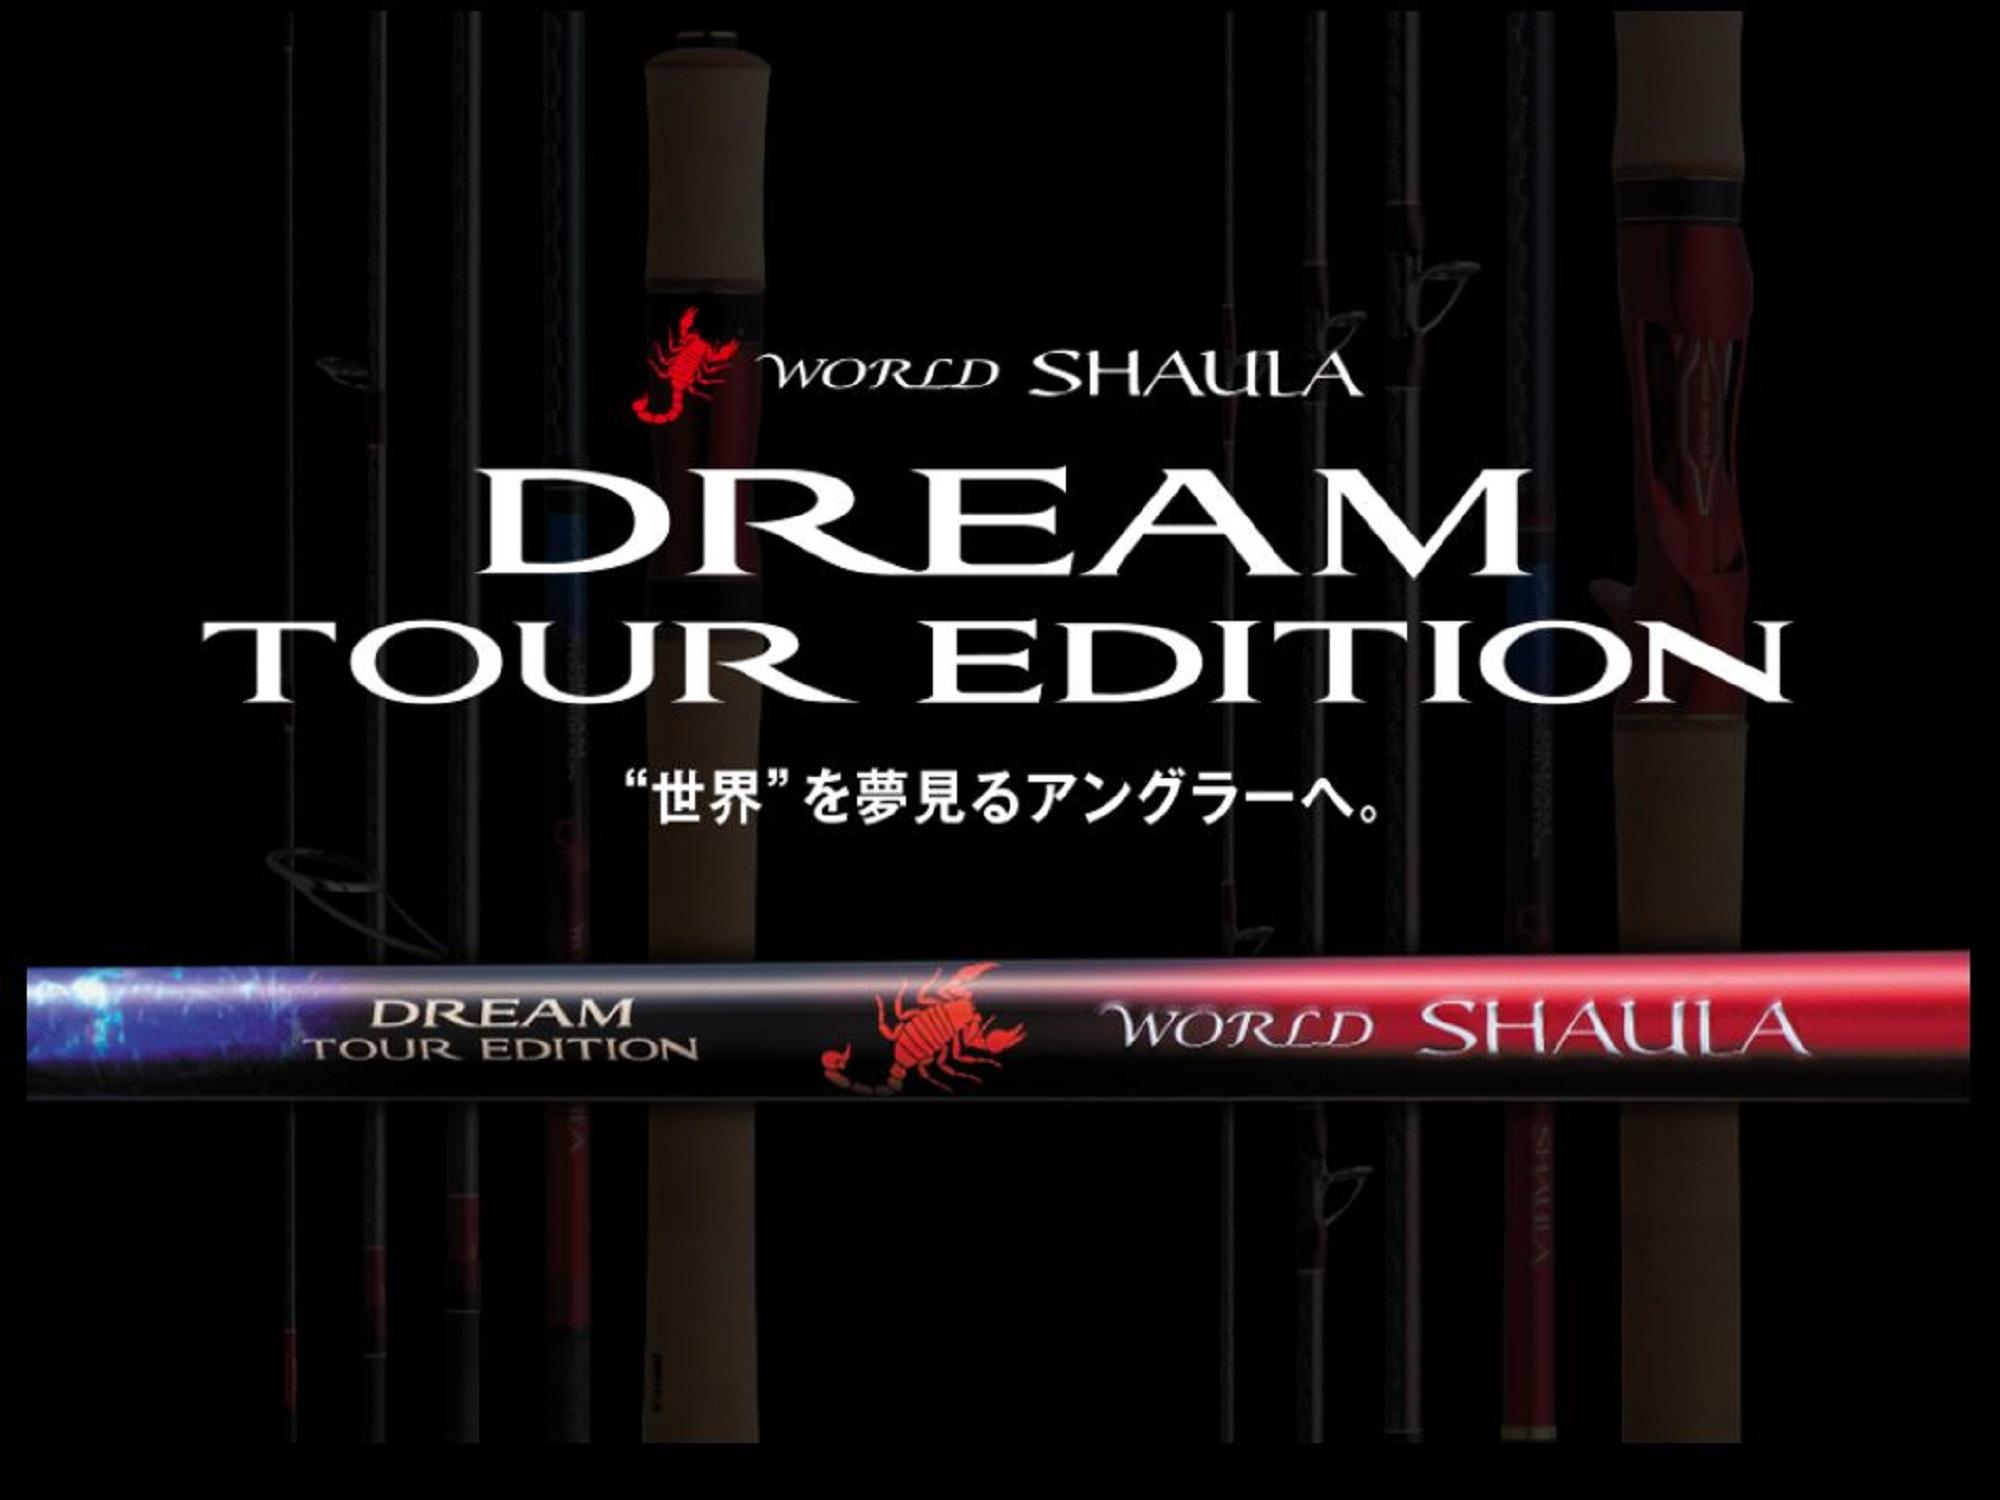 Shimano Rod Baitcast World Shaula Dream Tour 1653R-5 Travel Rod 397331